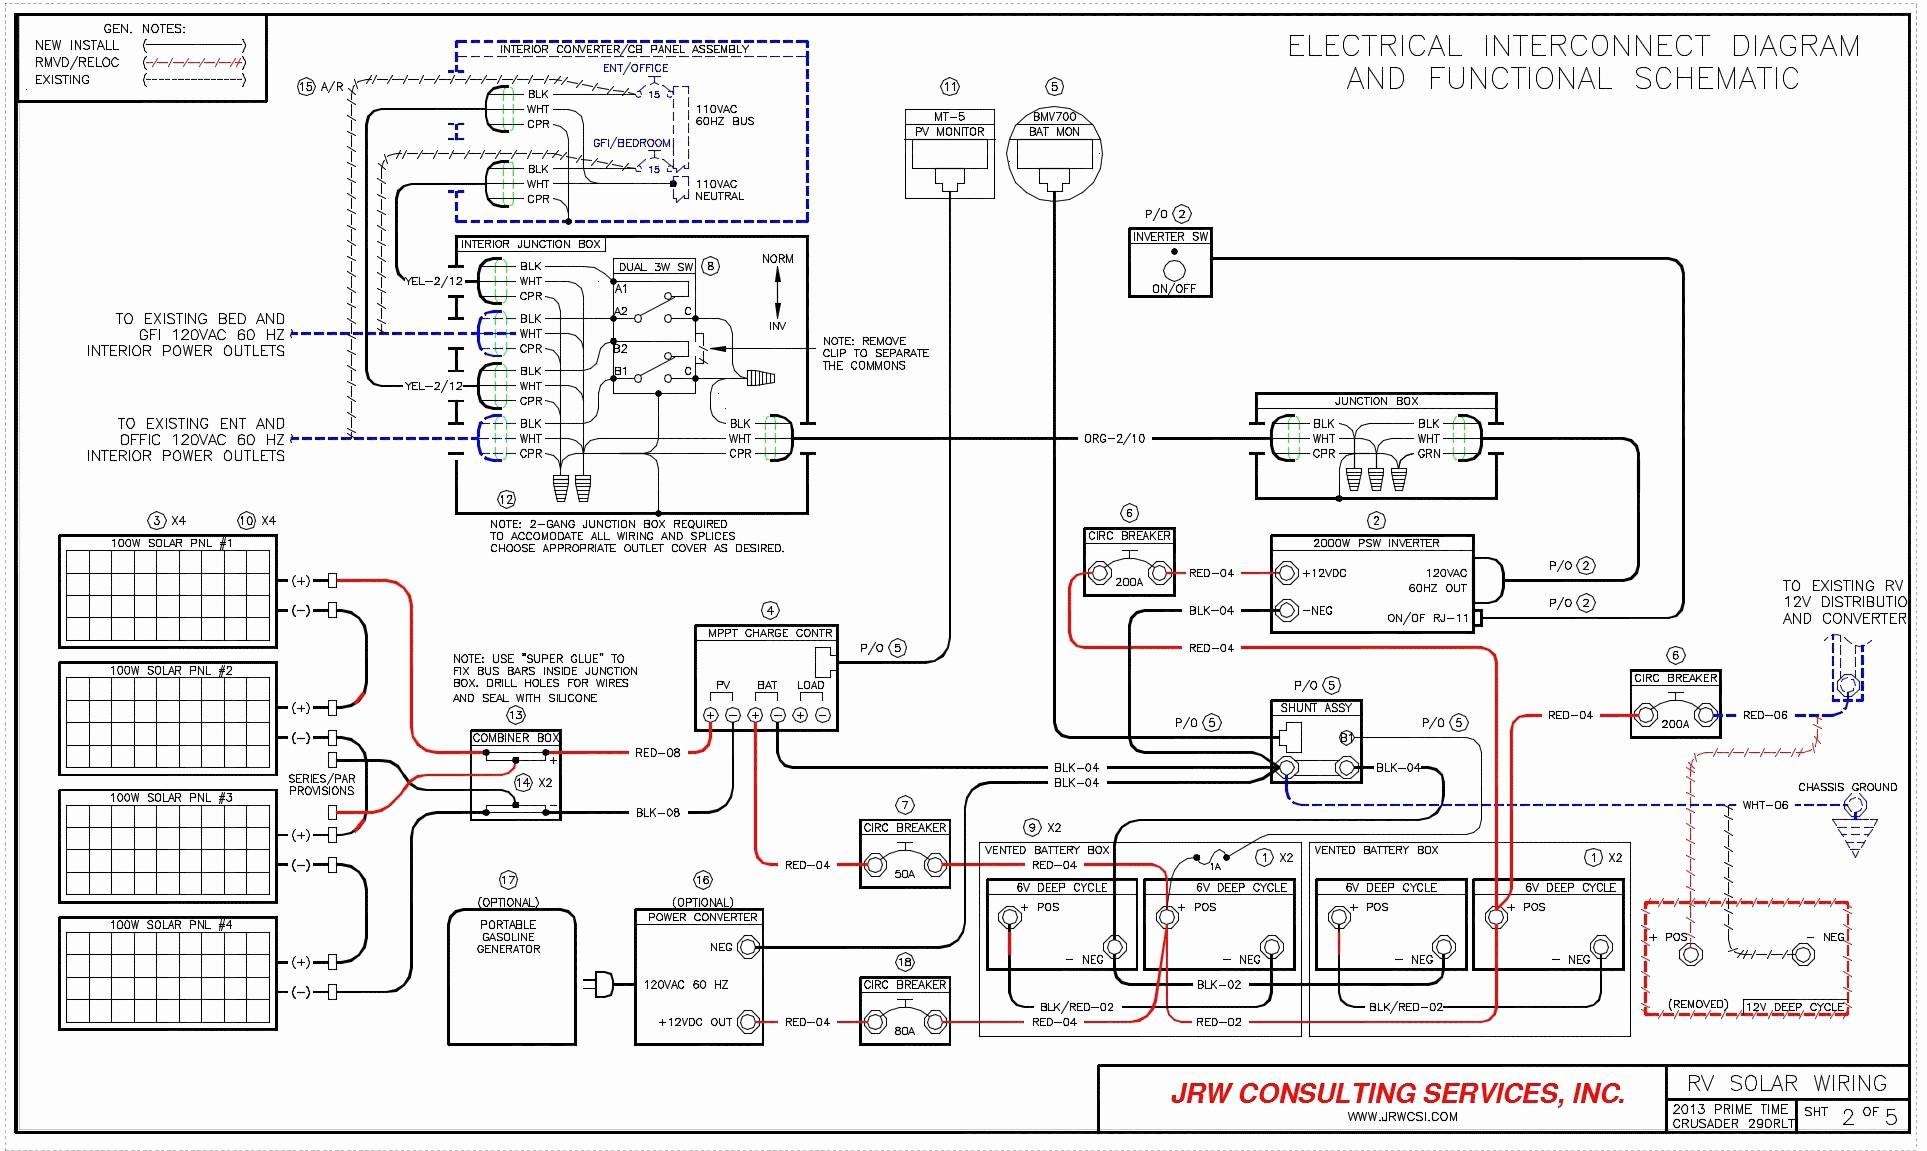 Generator Backfeed Wiring Diagram Fresh Wiring Diagram Solar Panel - Generator Backfeed Wiring Diagram